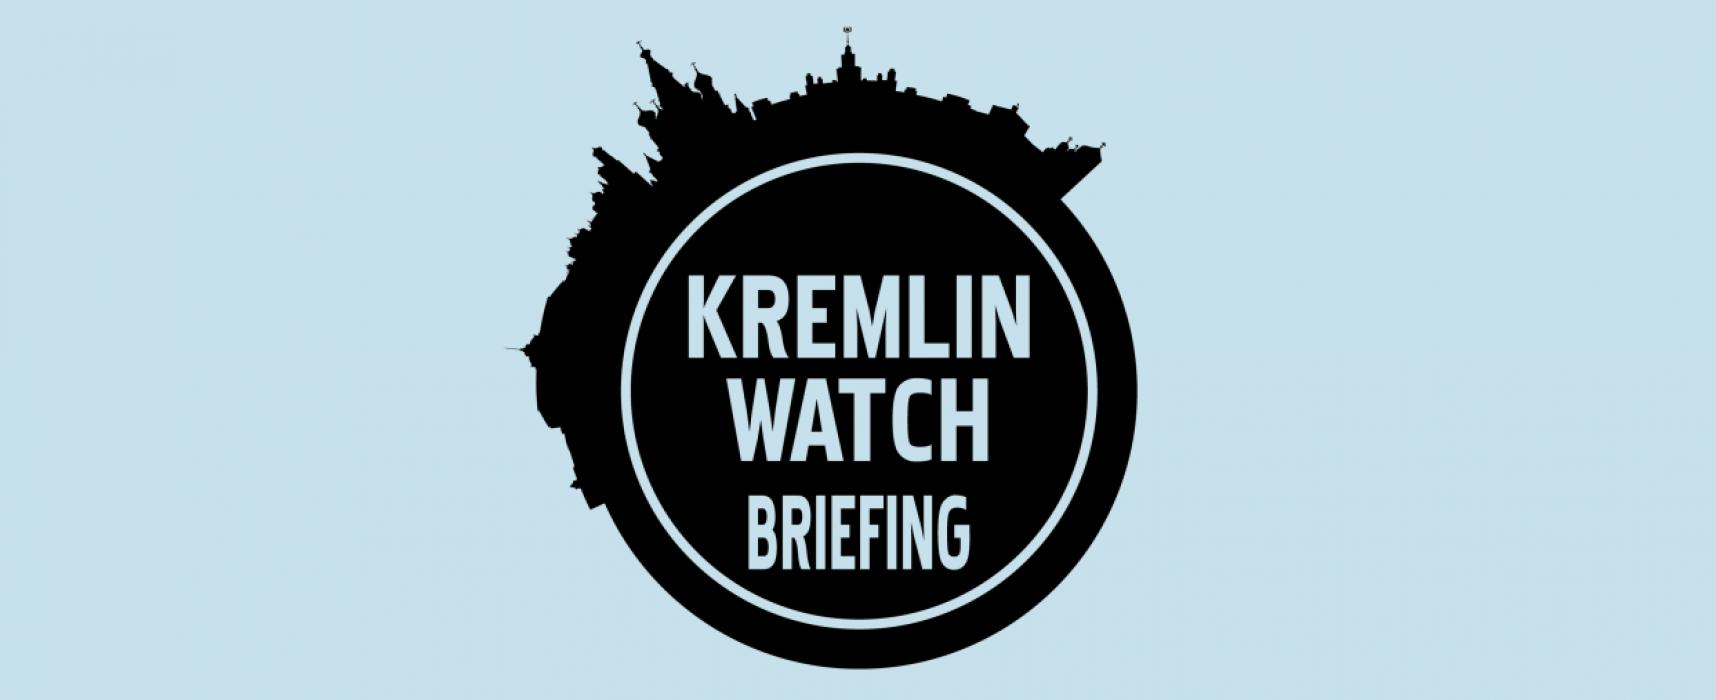 Kremlin Watch Briefing: Russian trolls and U.S. politics